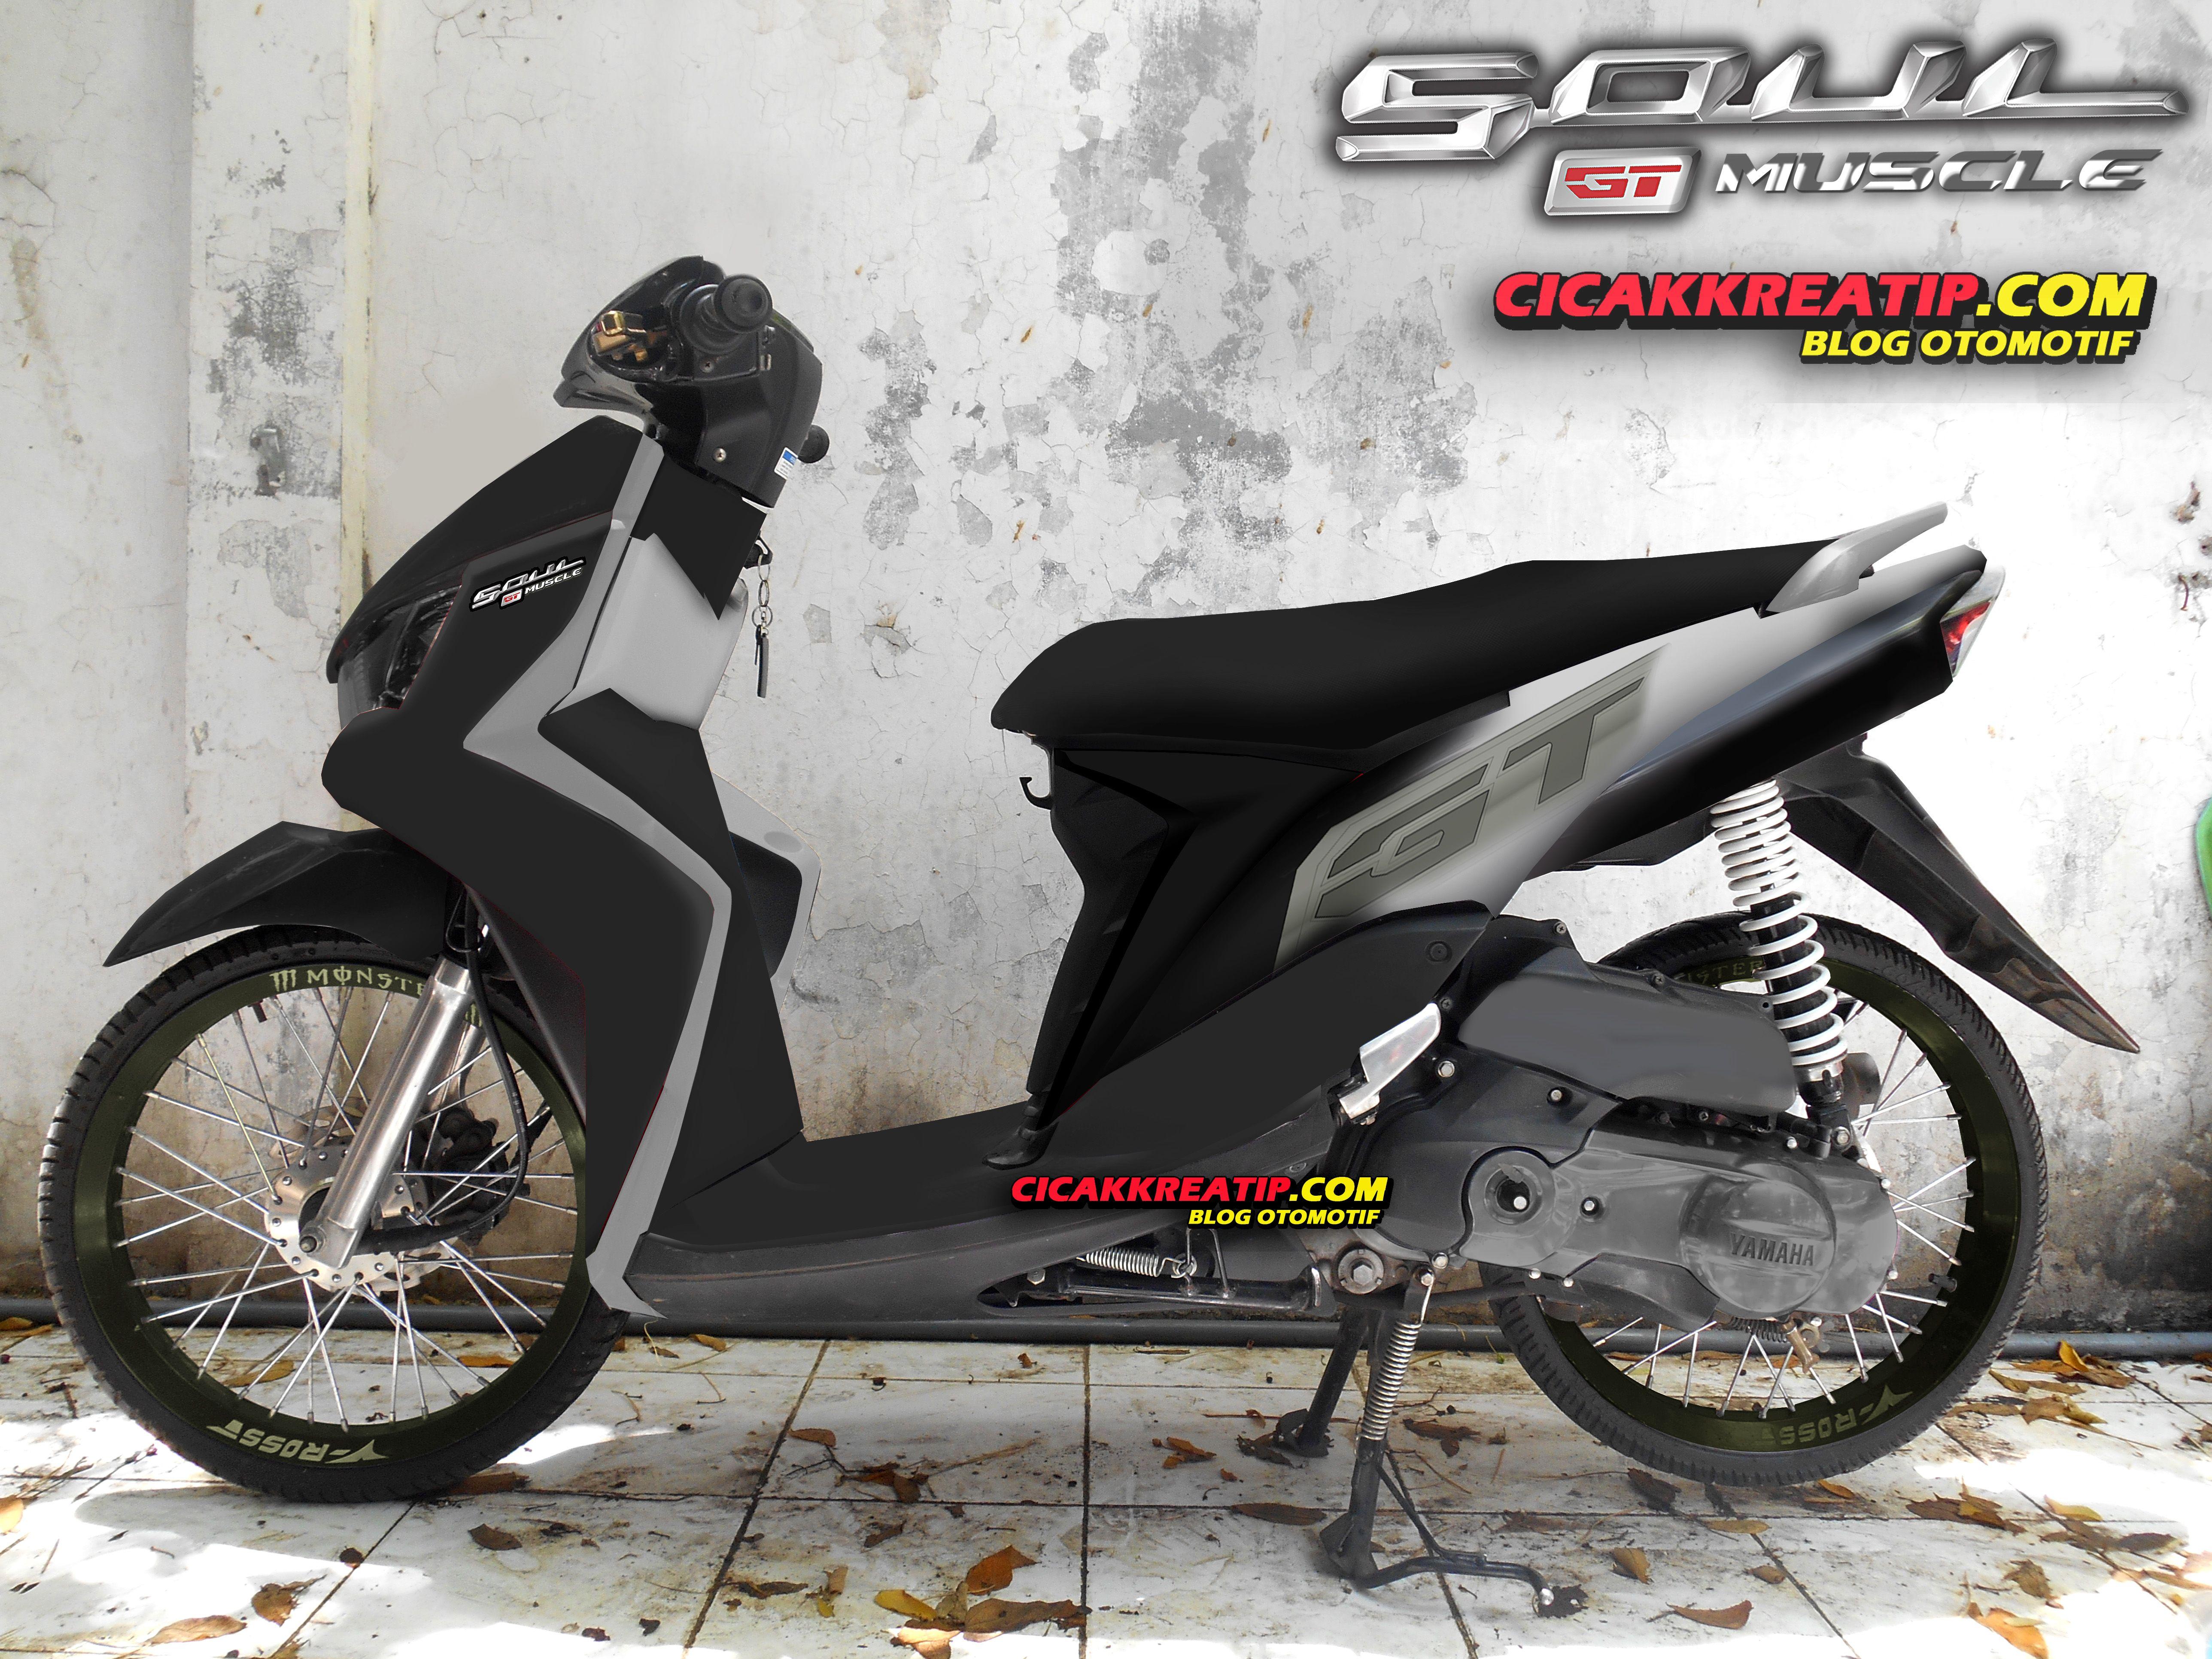 Modifikasi Motor Mio Warna Abu Abu In 2020